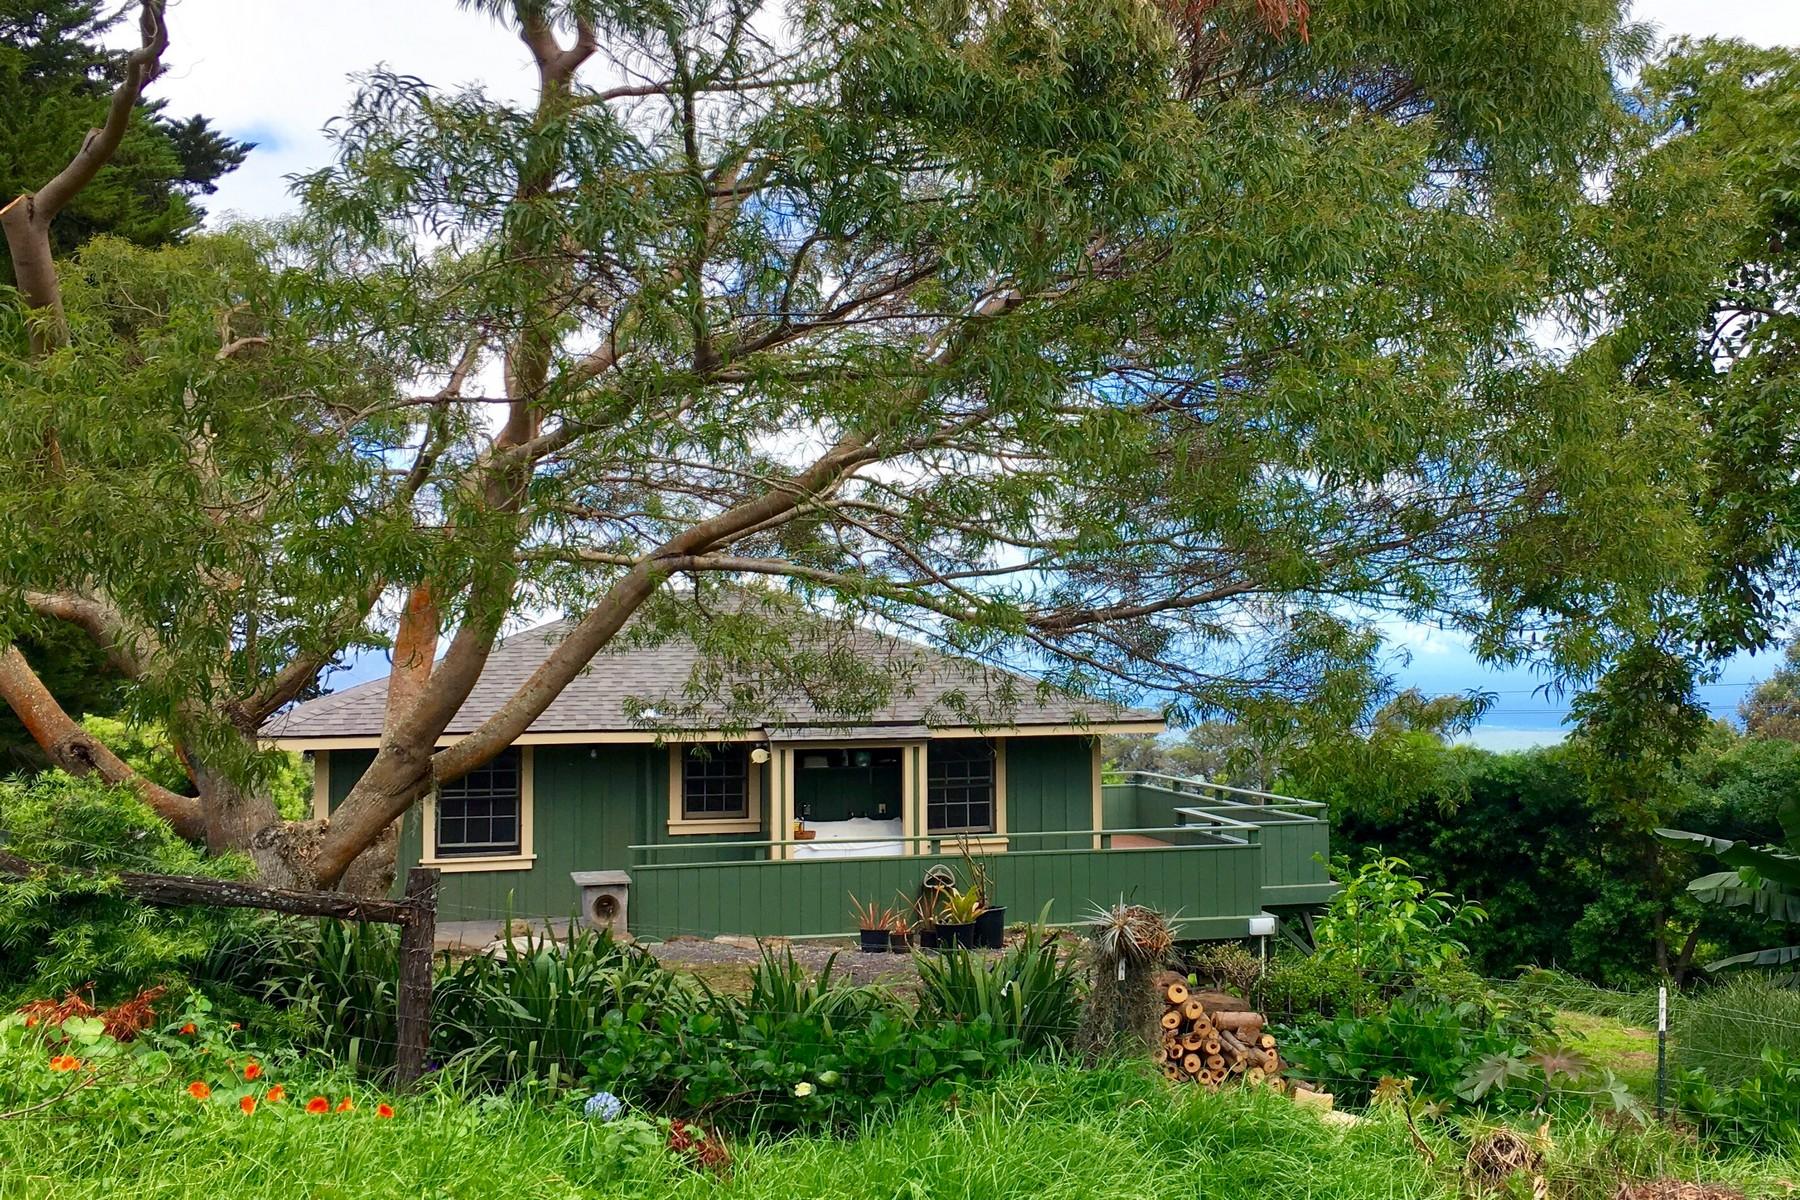 Einfamilienhaus für Verkauf beim Sweet & Charming Kula Plantation House 91 Waiakoa Road Kula, Hawaii, 96790 Vereinigte Staaten